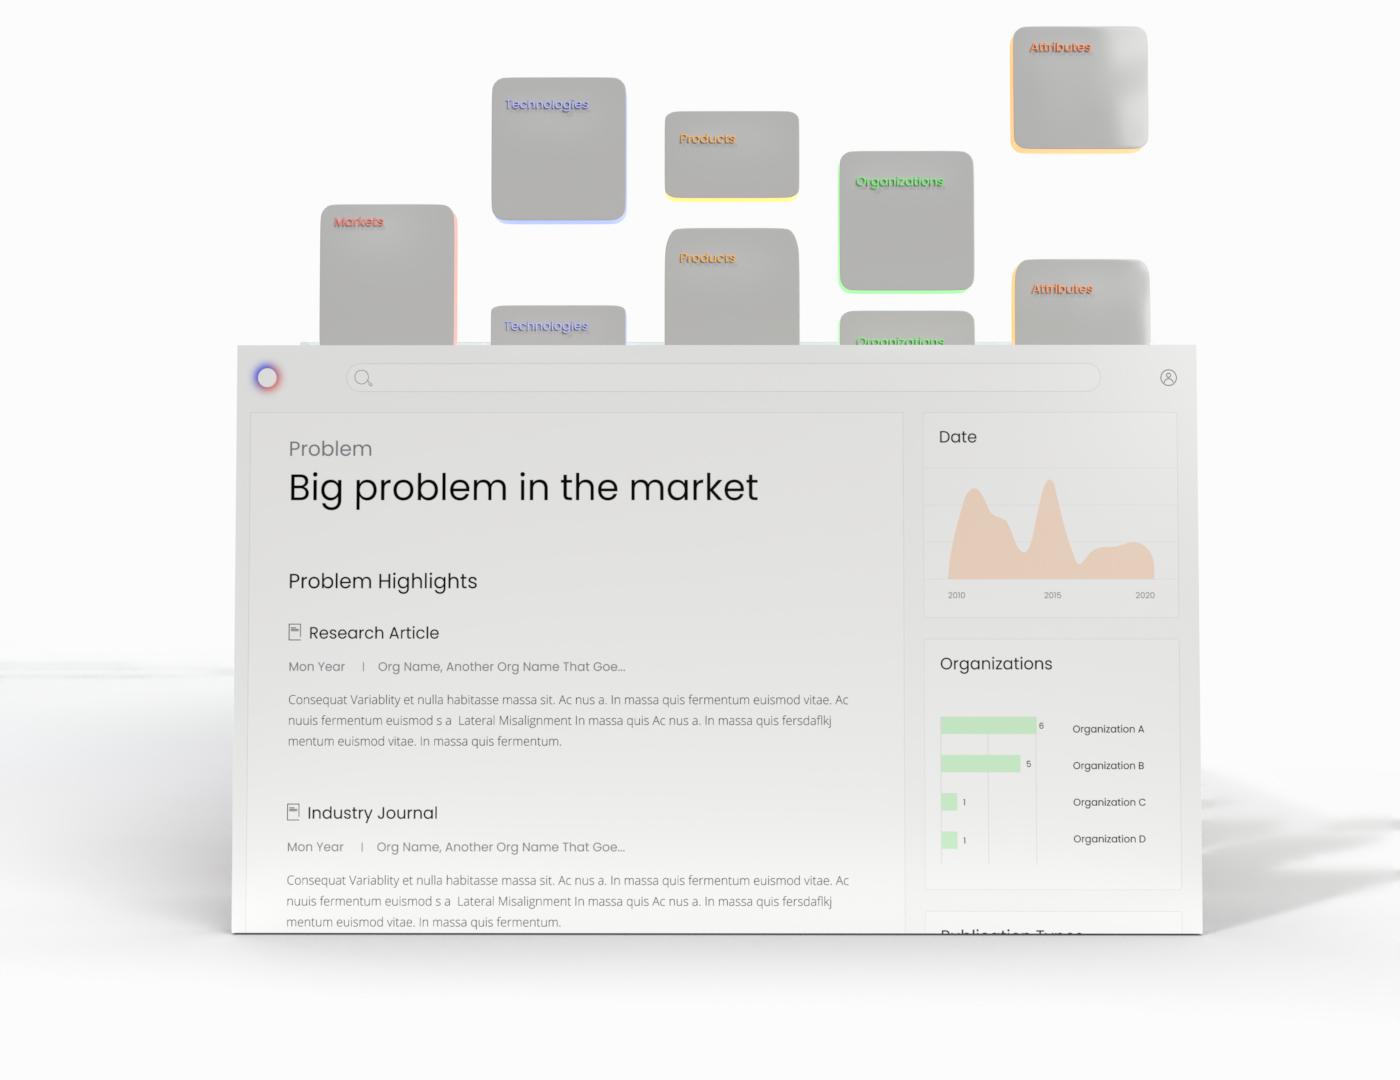 Aperture - How it Works Step 4: Analyze problems using our web platform.